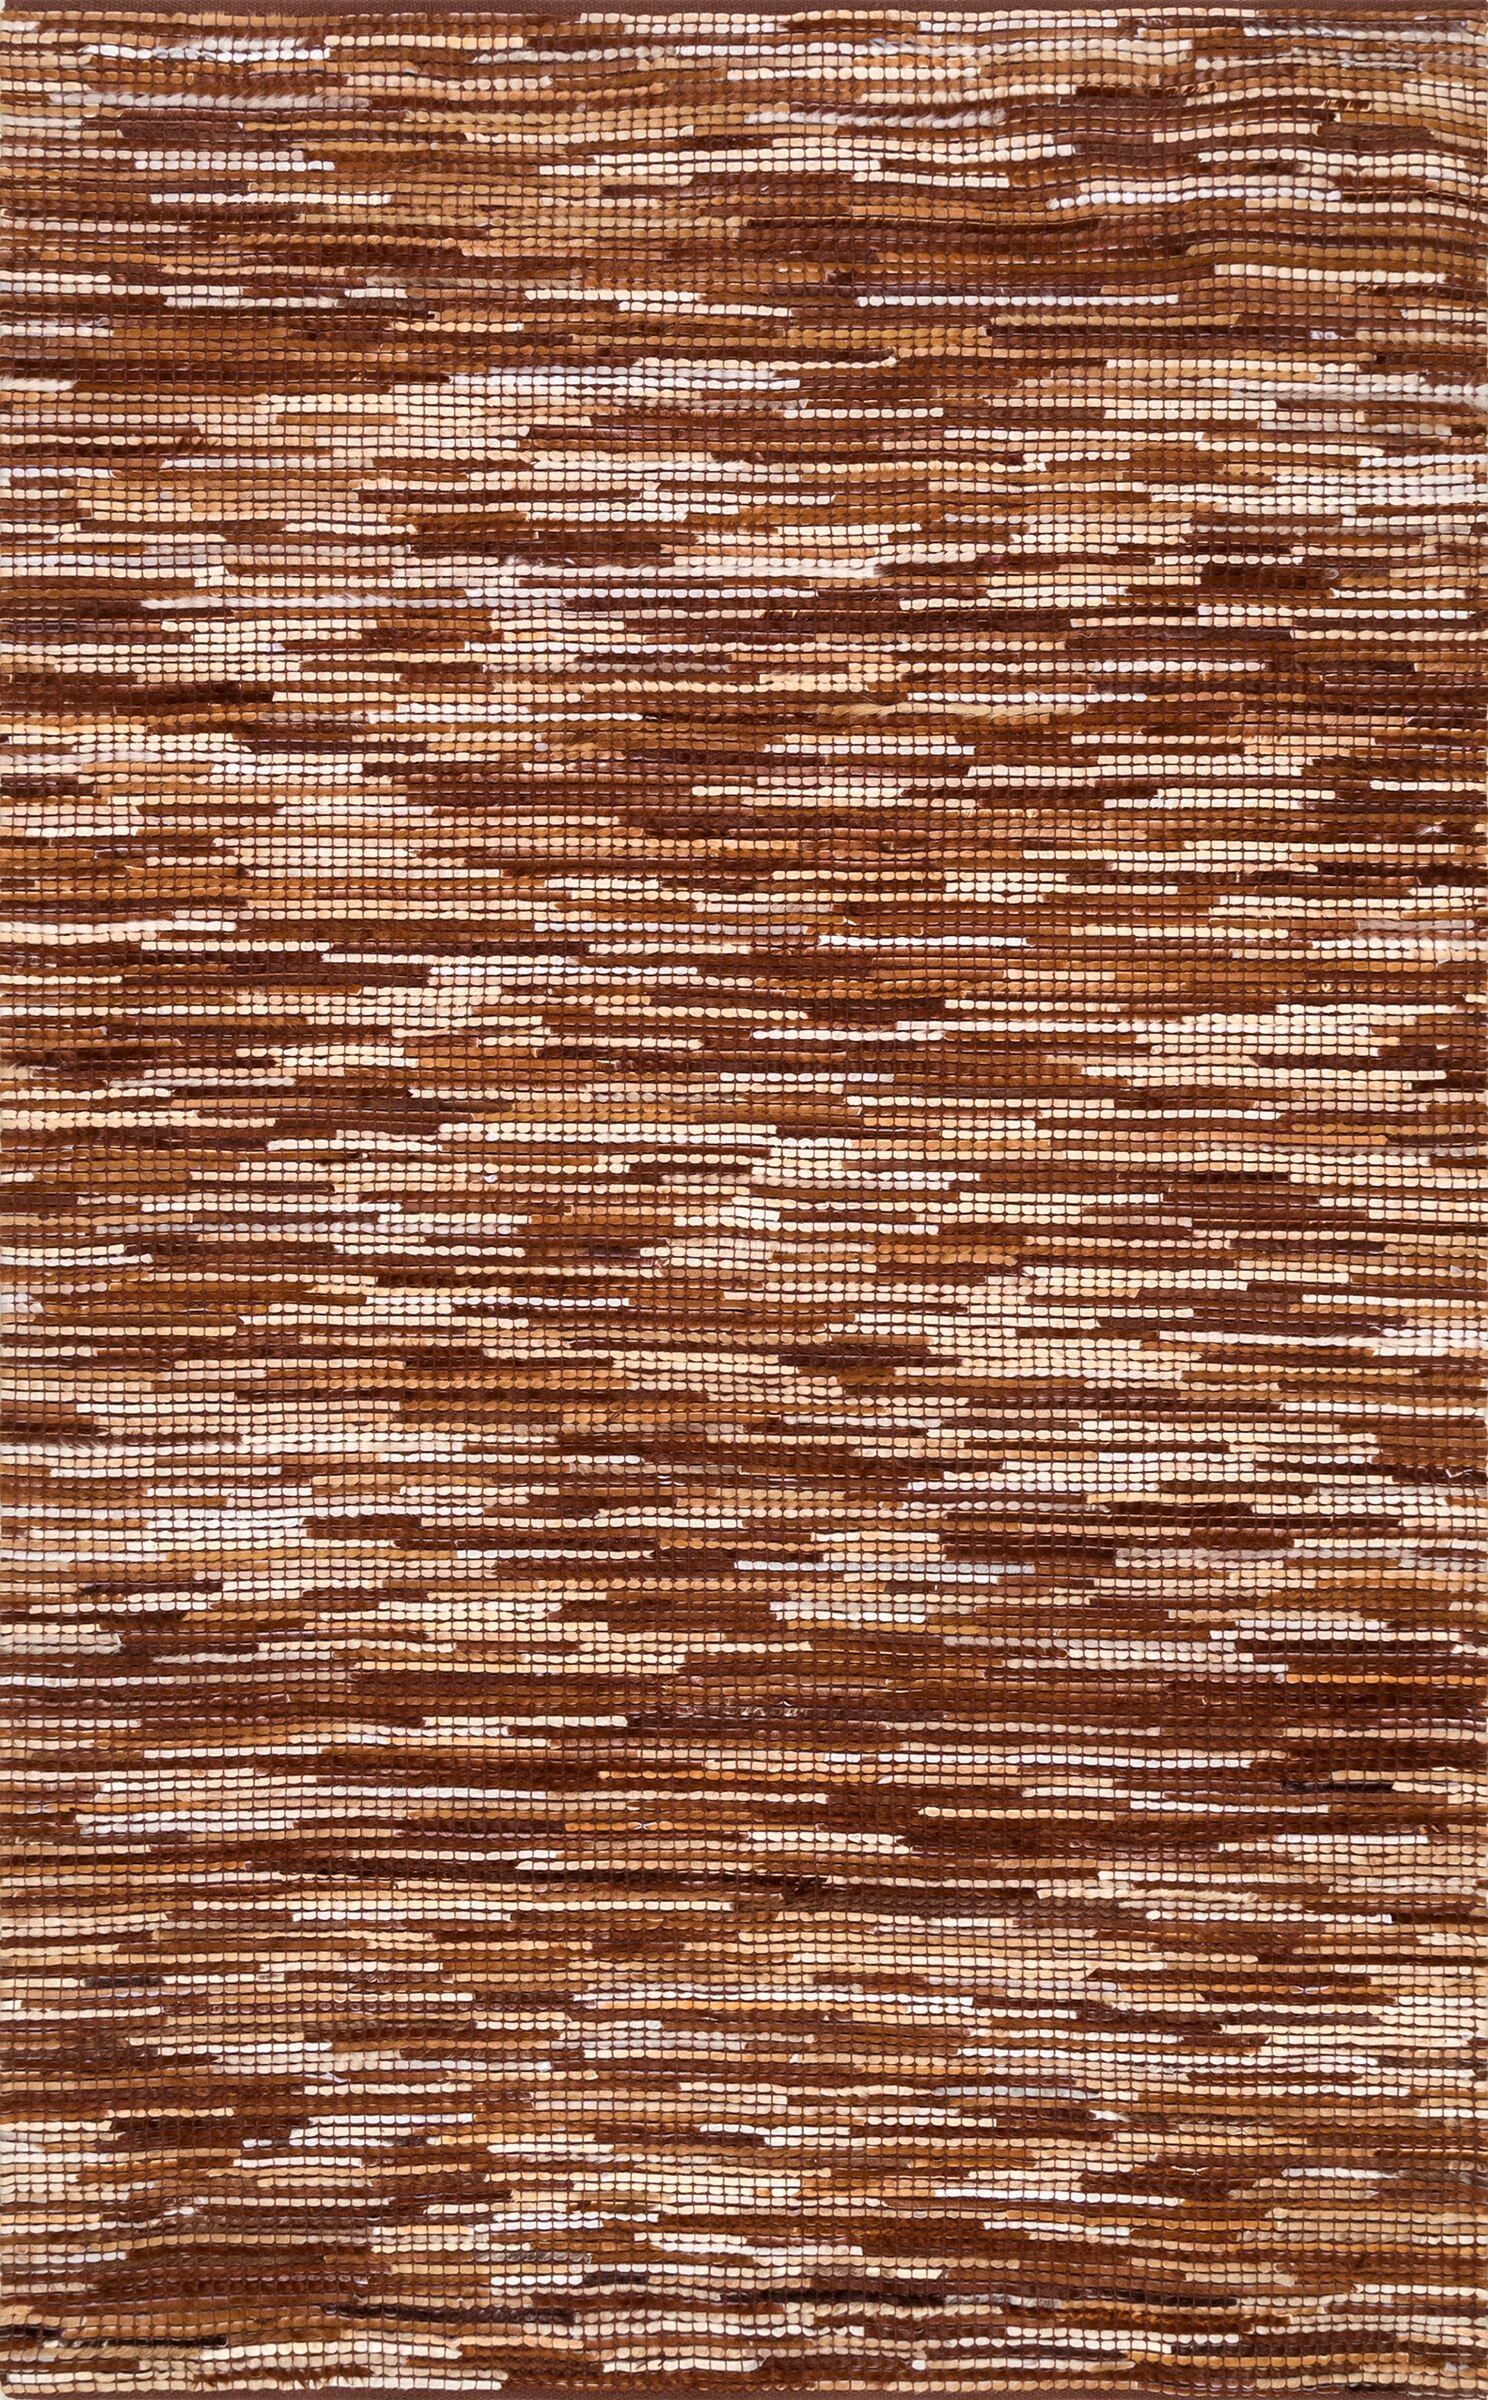 Olander Hand-Woven Light Brown Area Rug Rug Size: Rectangle 7'6